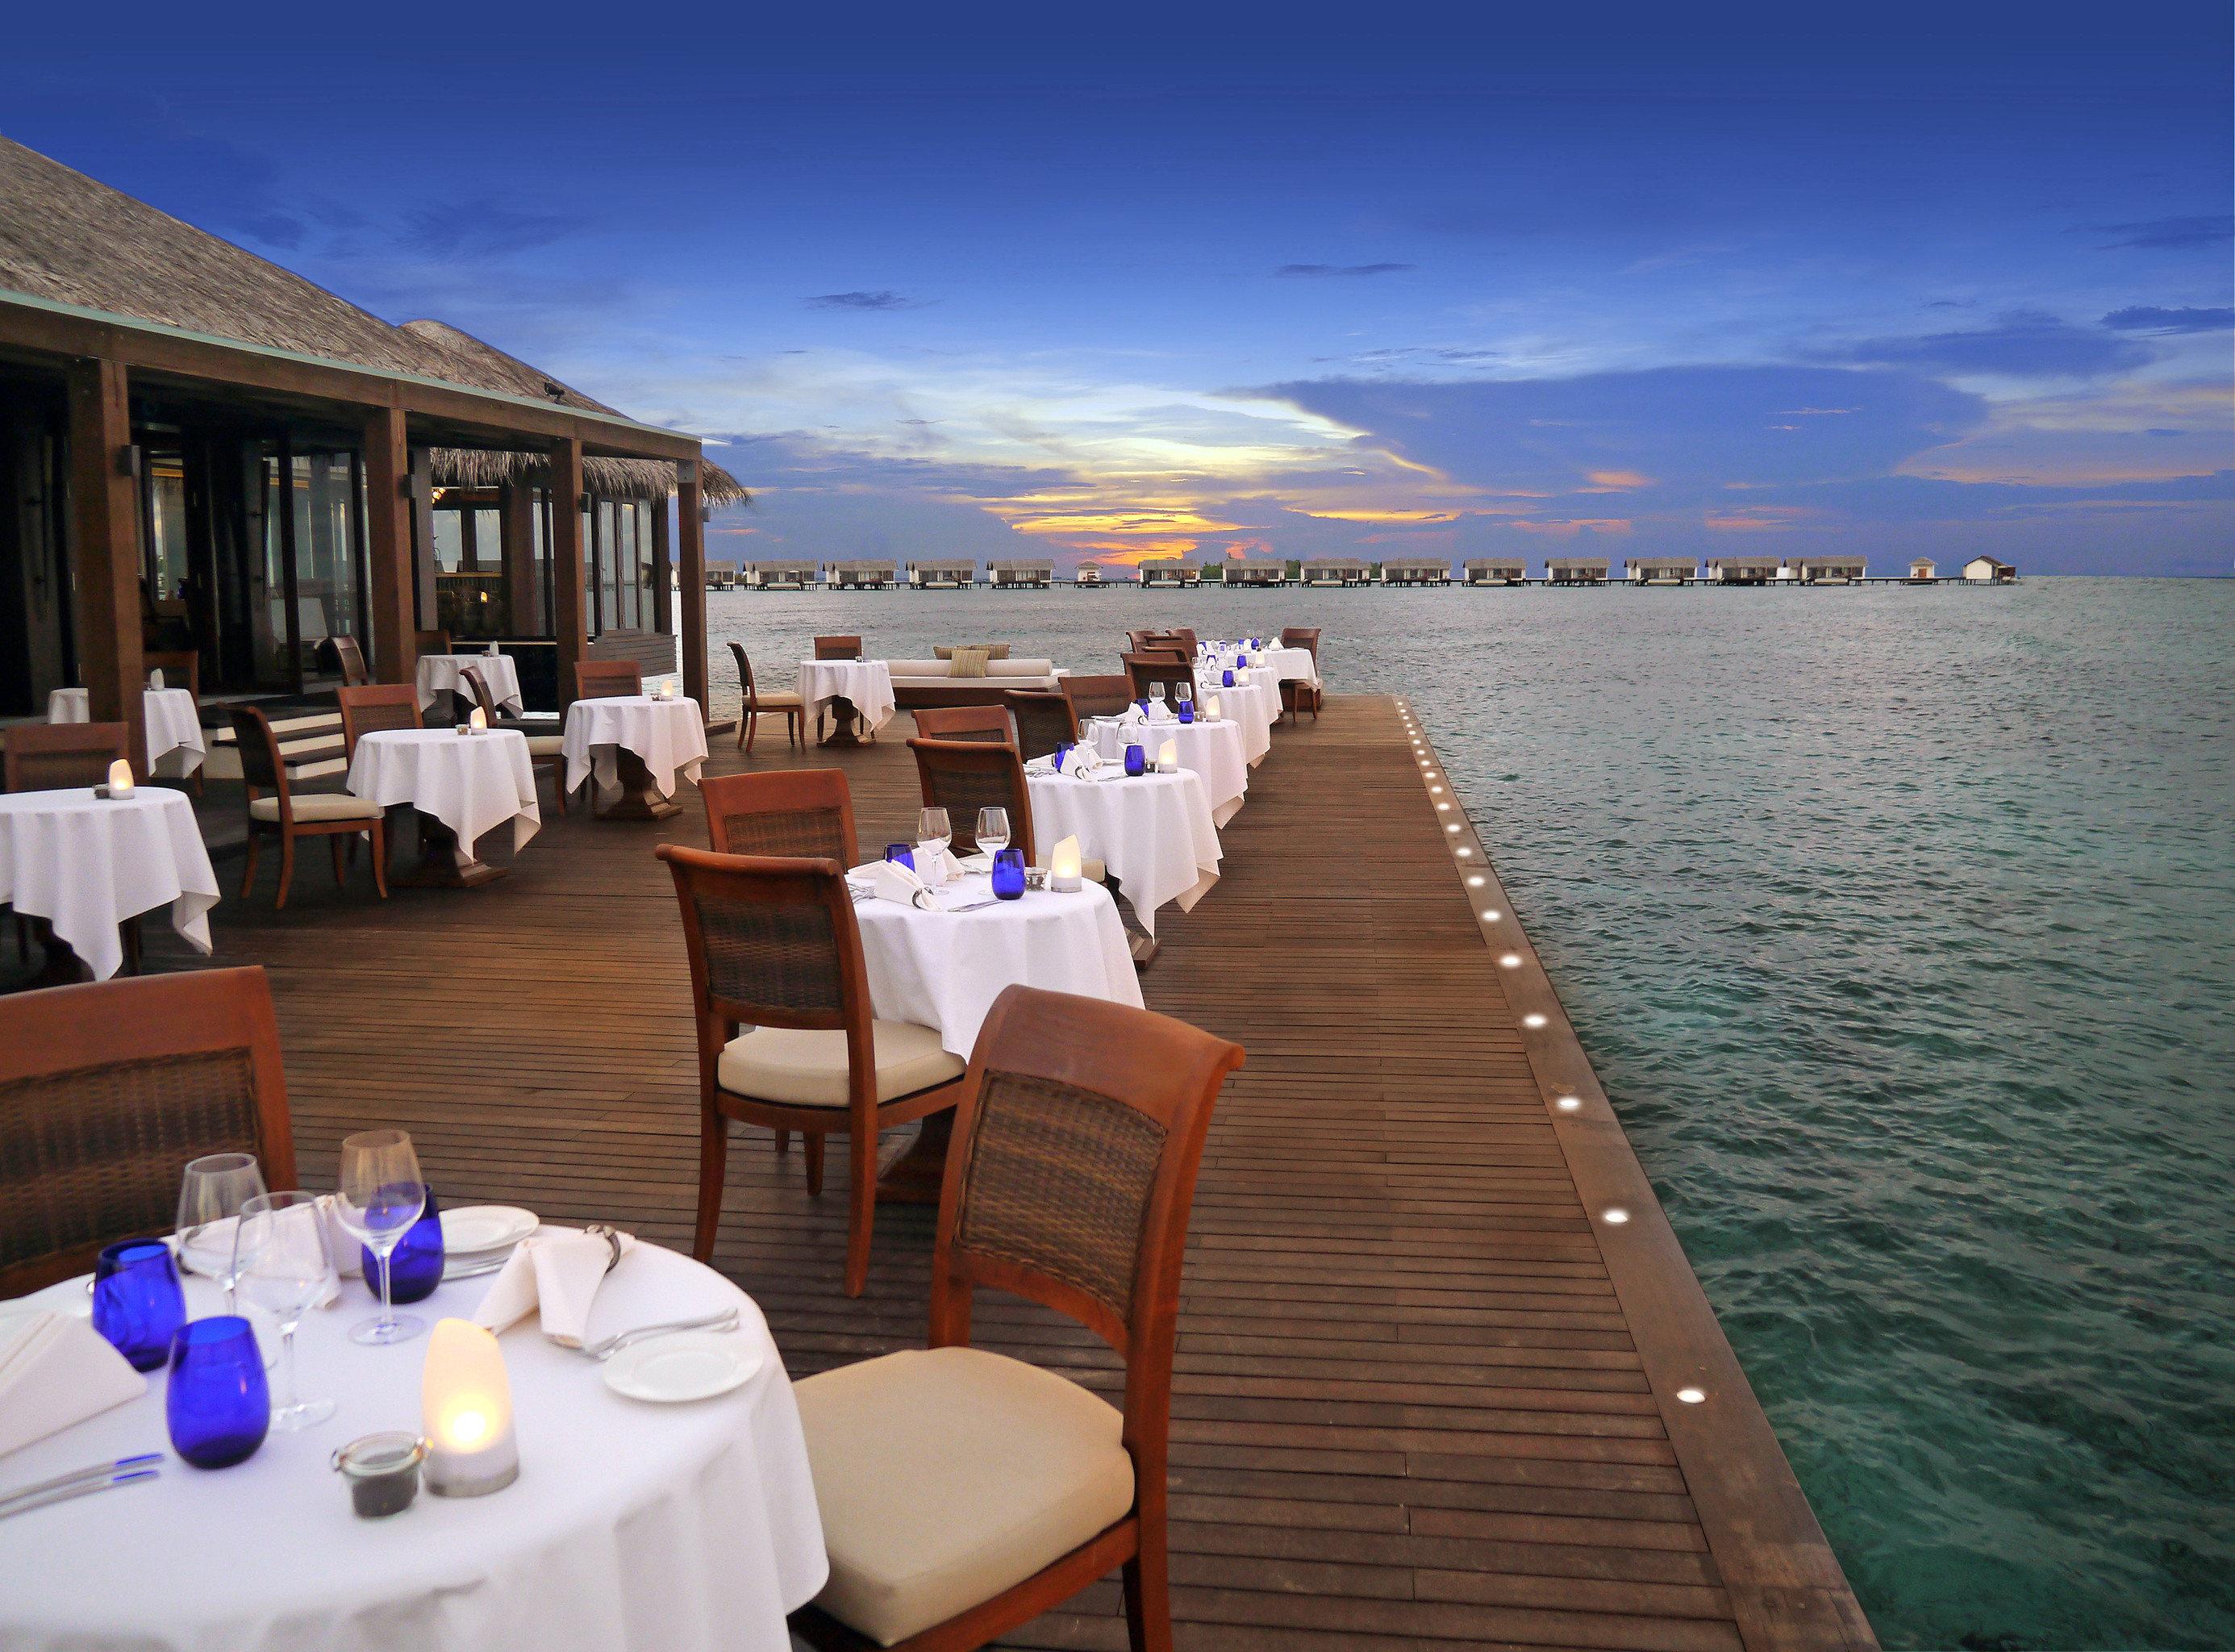 Beachfront Deck Drink Eat Elegant Luxury Ocean Romantic sky water wooden vehicle Resort passenger ship caribbean Sea restaurant overlooking Island